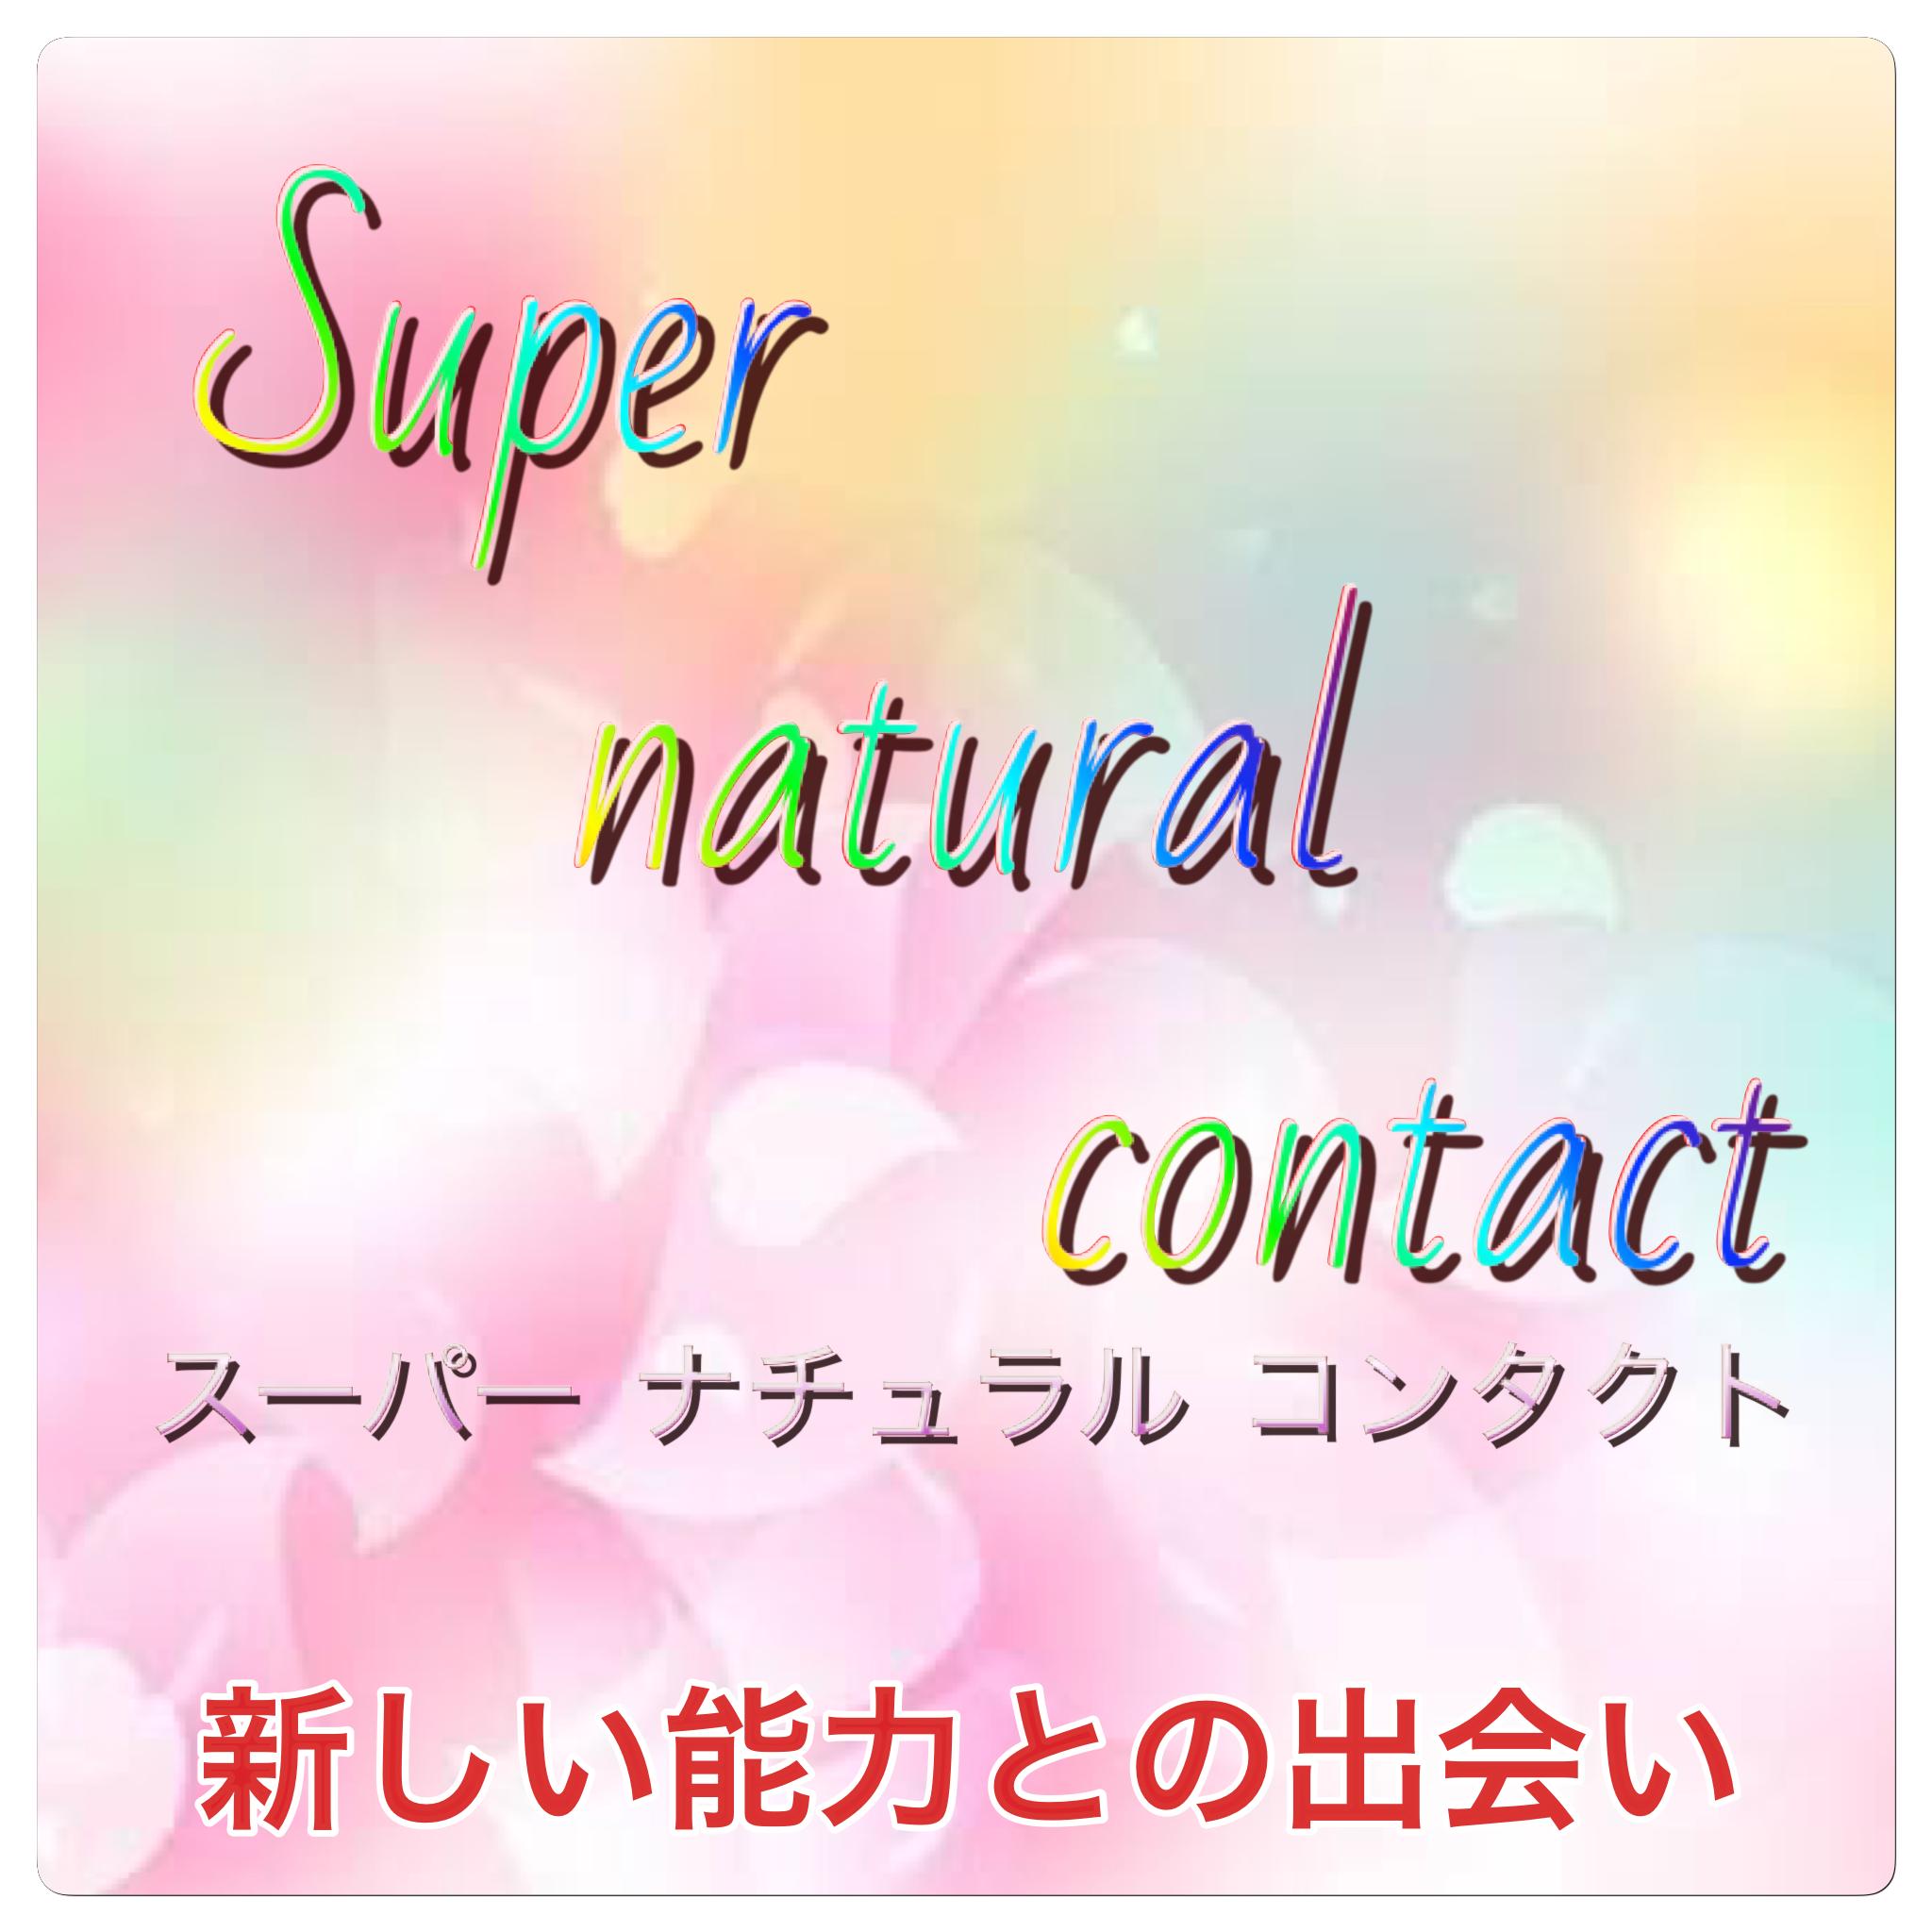 f:id:Ichiodo:20170511155806p:image